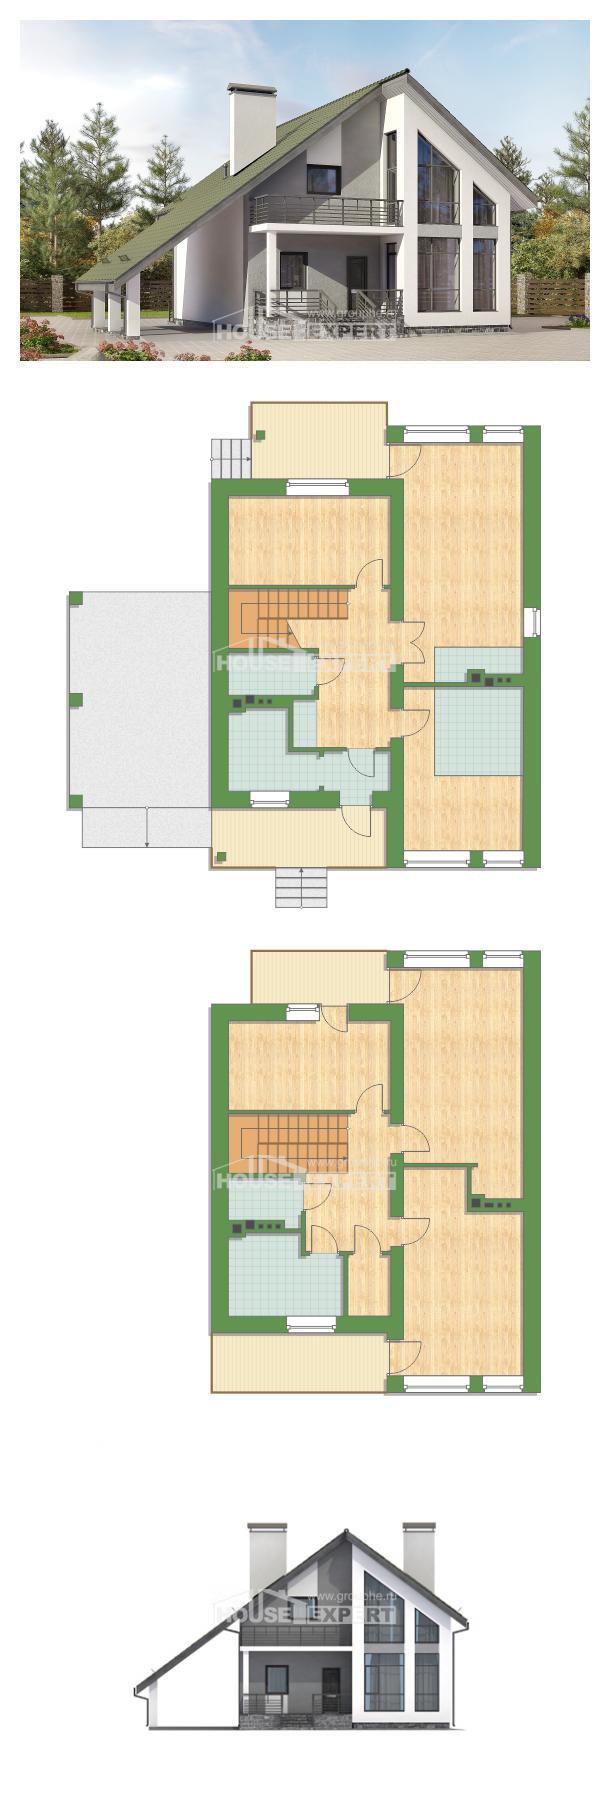 Проект дома 170-009-Л | House Expert